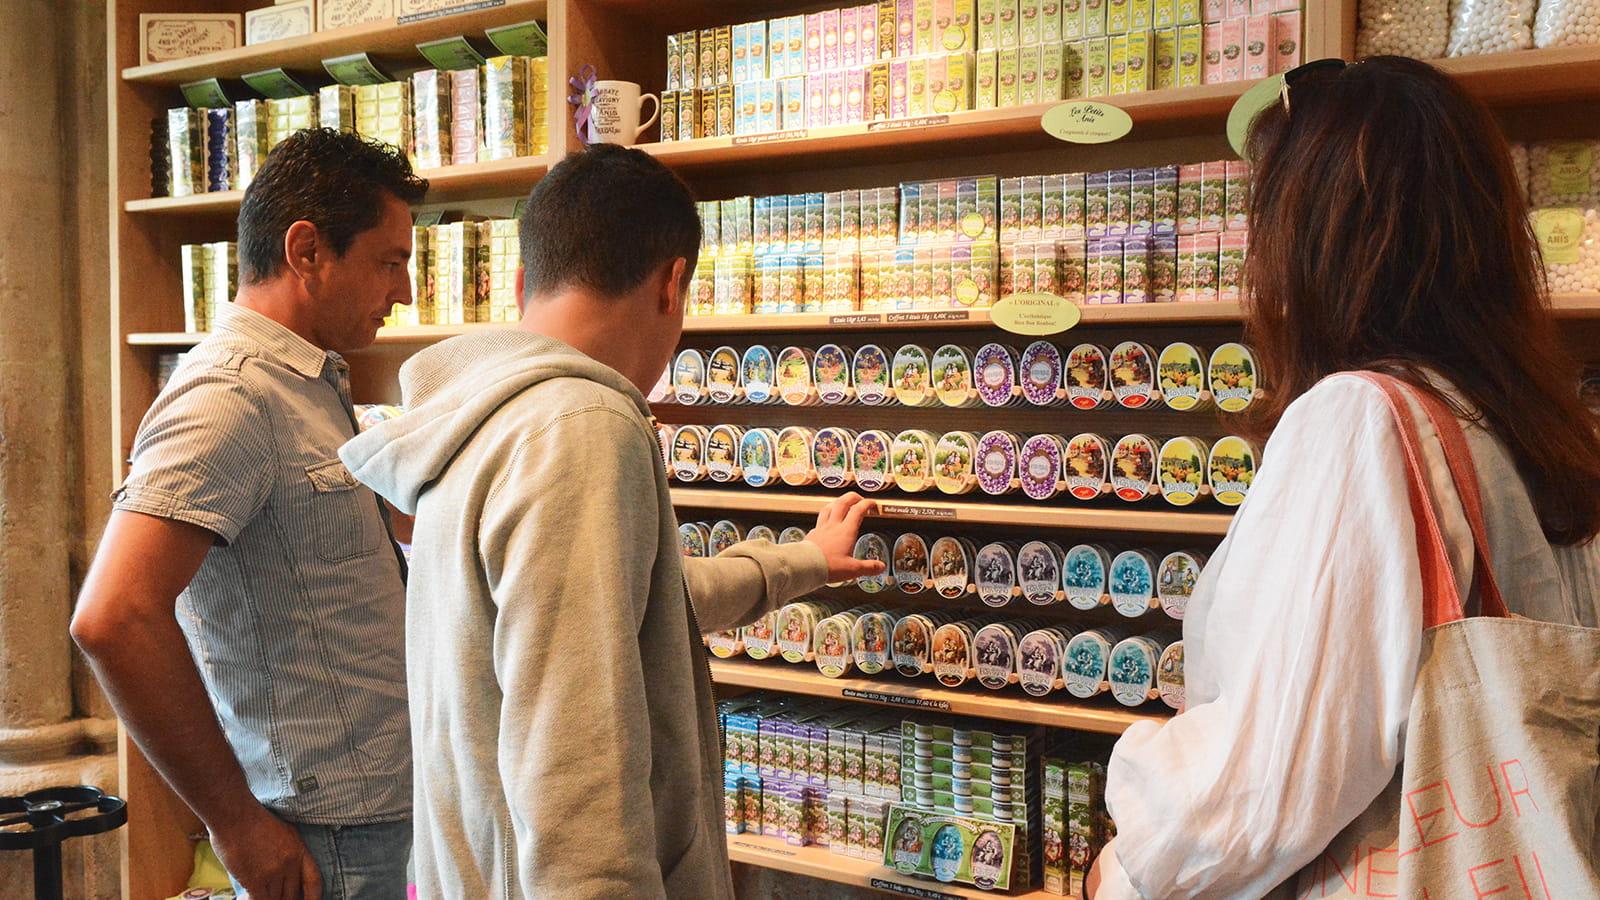 Rayons boutique des anis de Flavigny